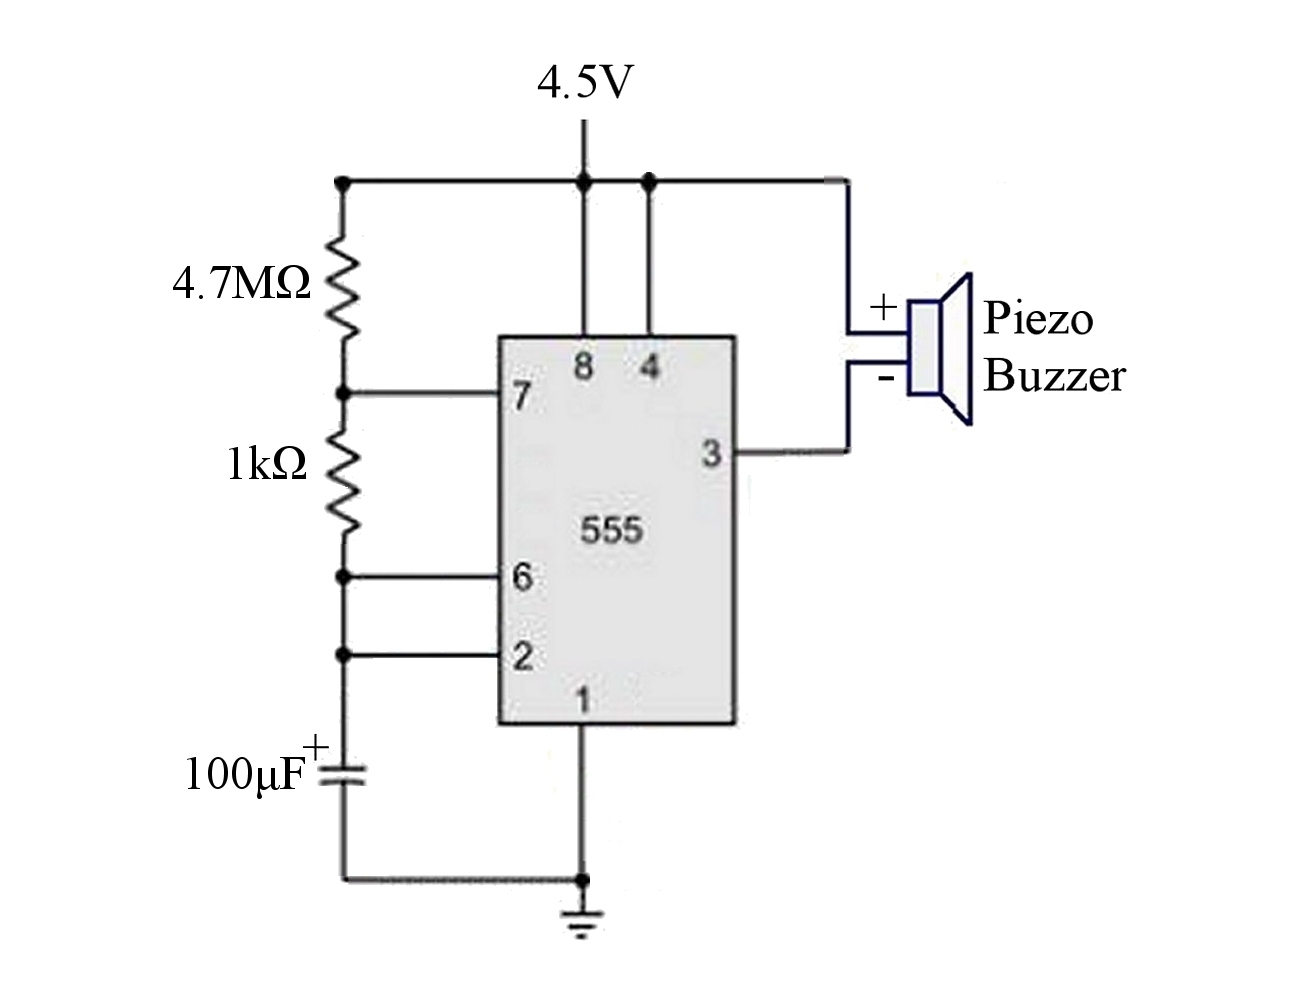 Ibanez Jem Wiring on Ibanez 7 String Wiring Diagram